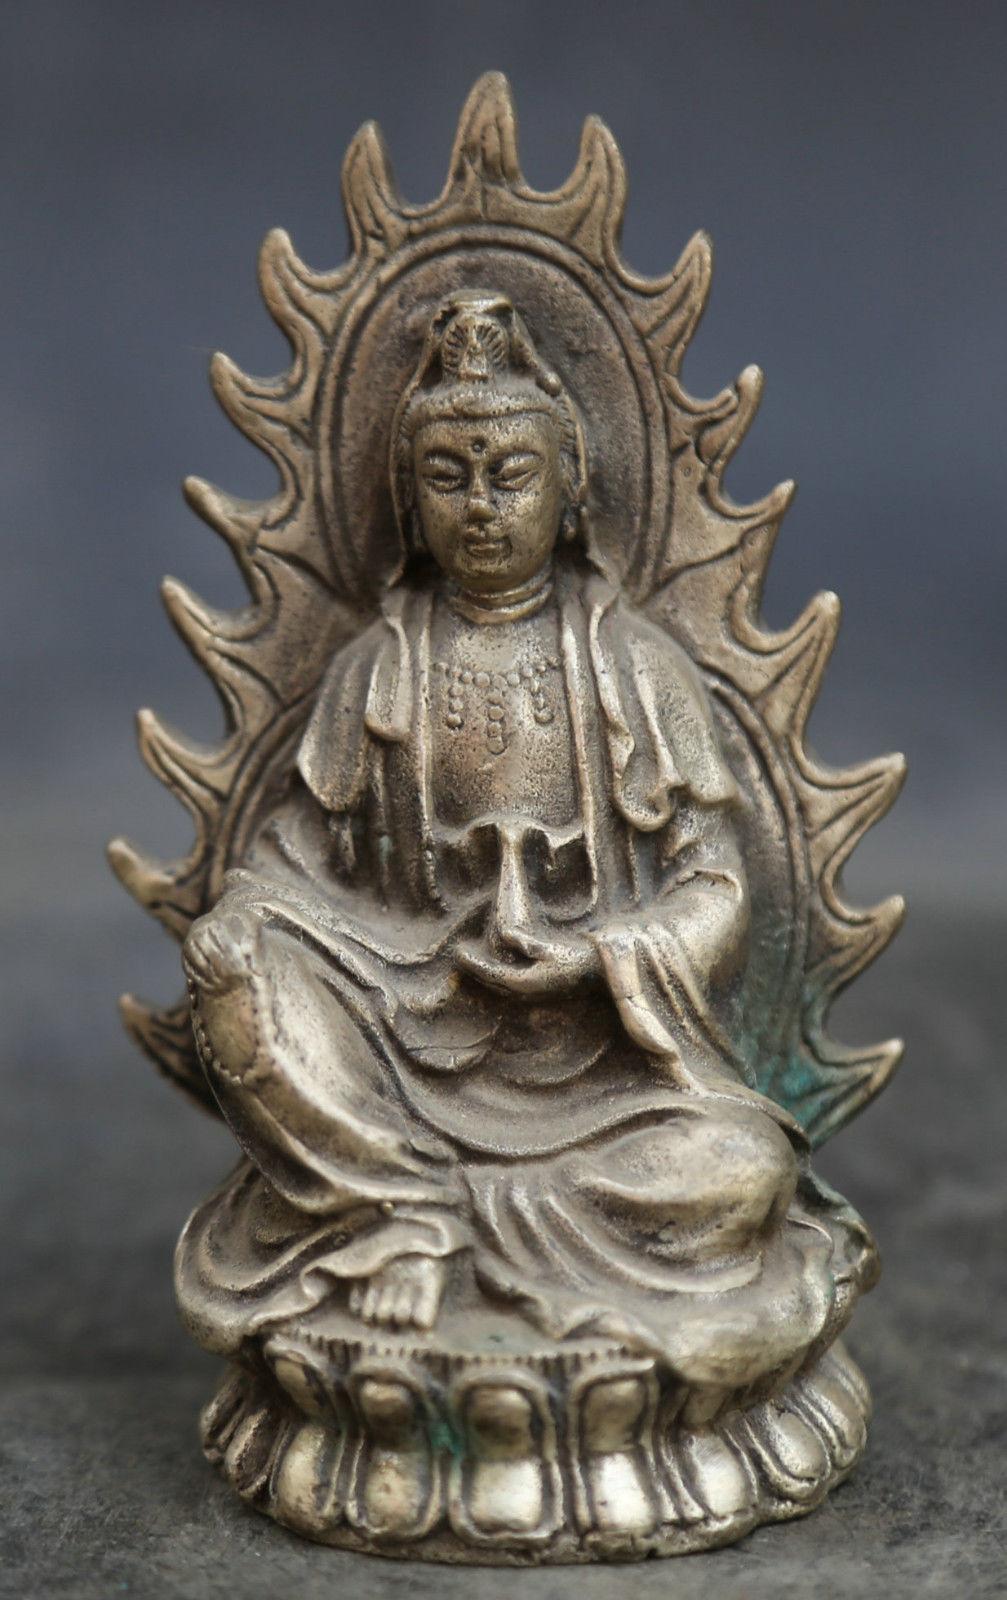 3.9 Cinese Buddismo Fengshui Bronzo Kwan-yin di Guan Yin Sit Fiore di Loto Statua3.9 Cinese Buddismo Fengshui Bronzo Kwan-yin di Guan Yin Sit Fiore di Loto Statua